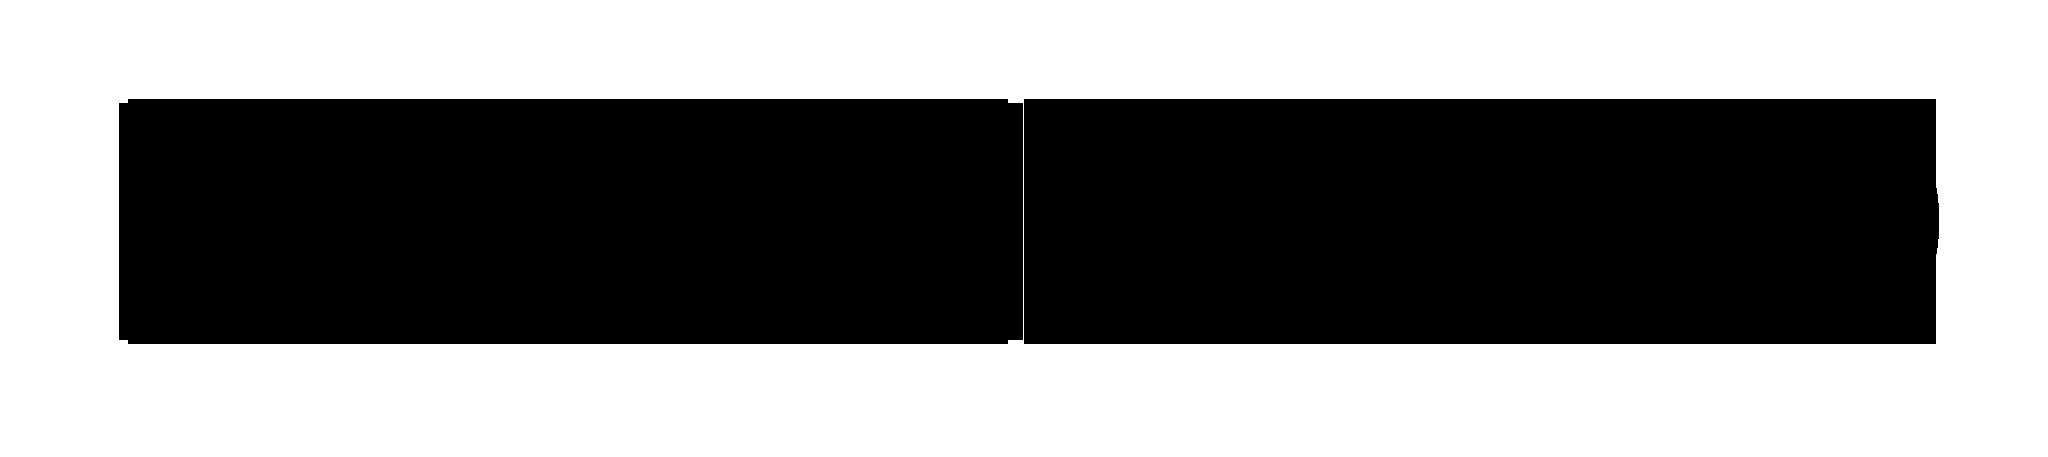 MultiRoad